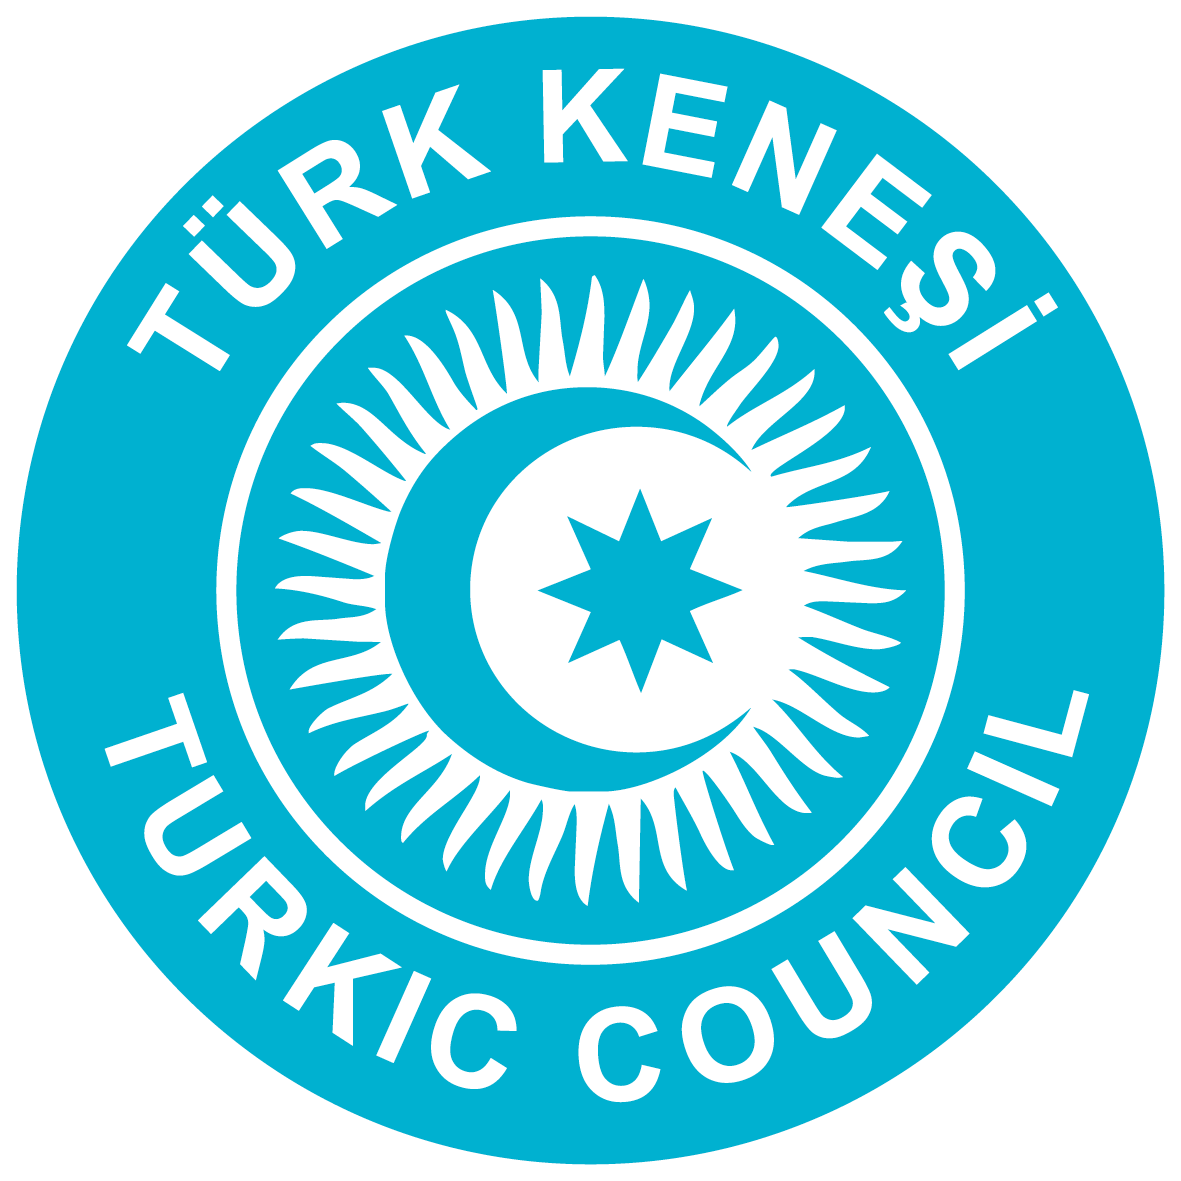 Turk Kenesi Turkic Council Logo 2020